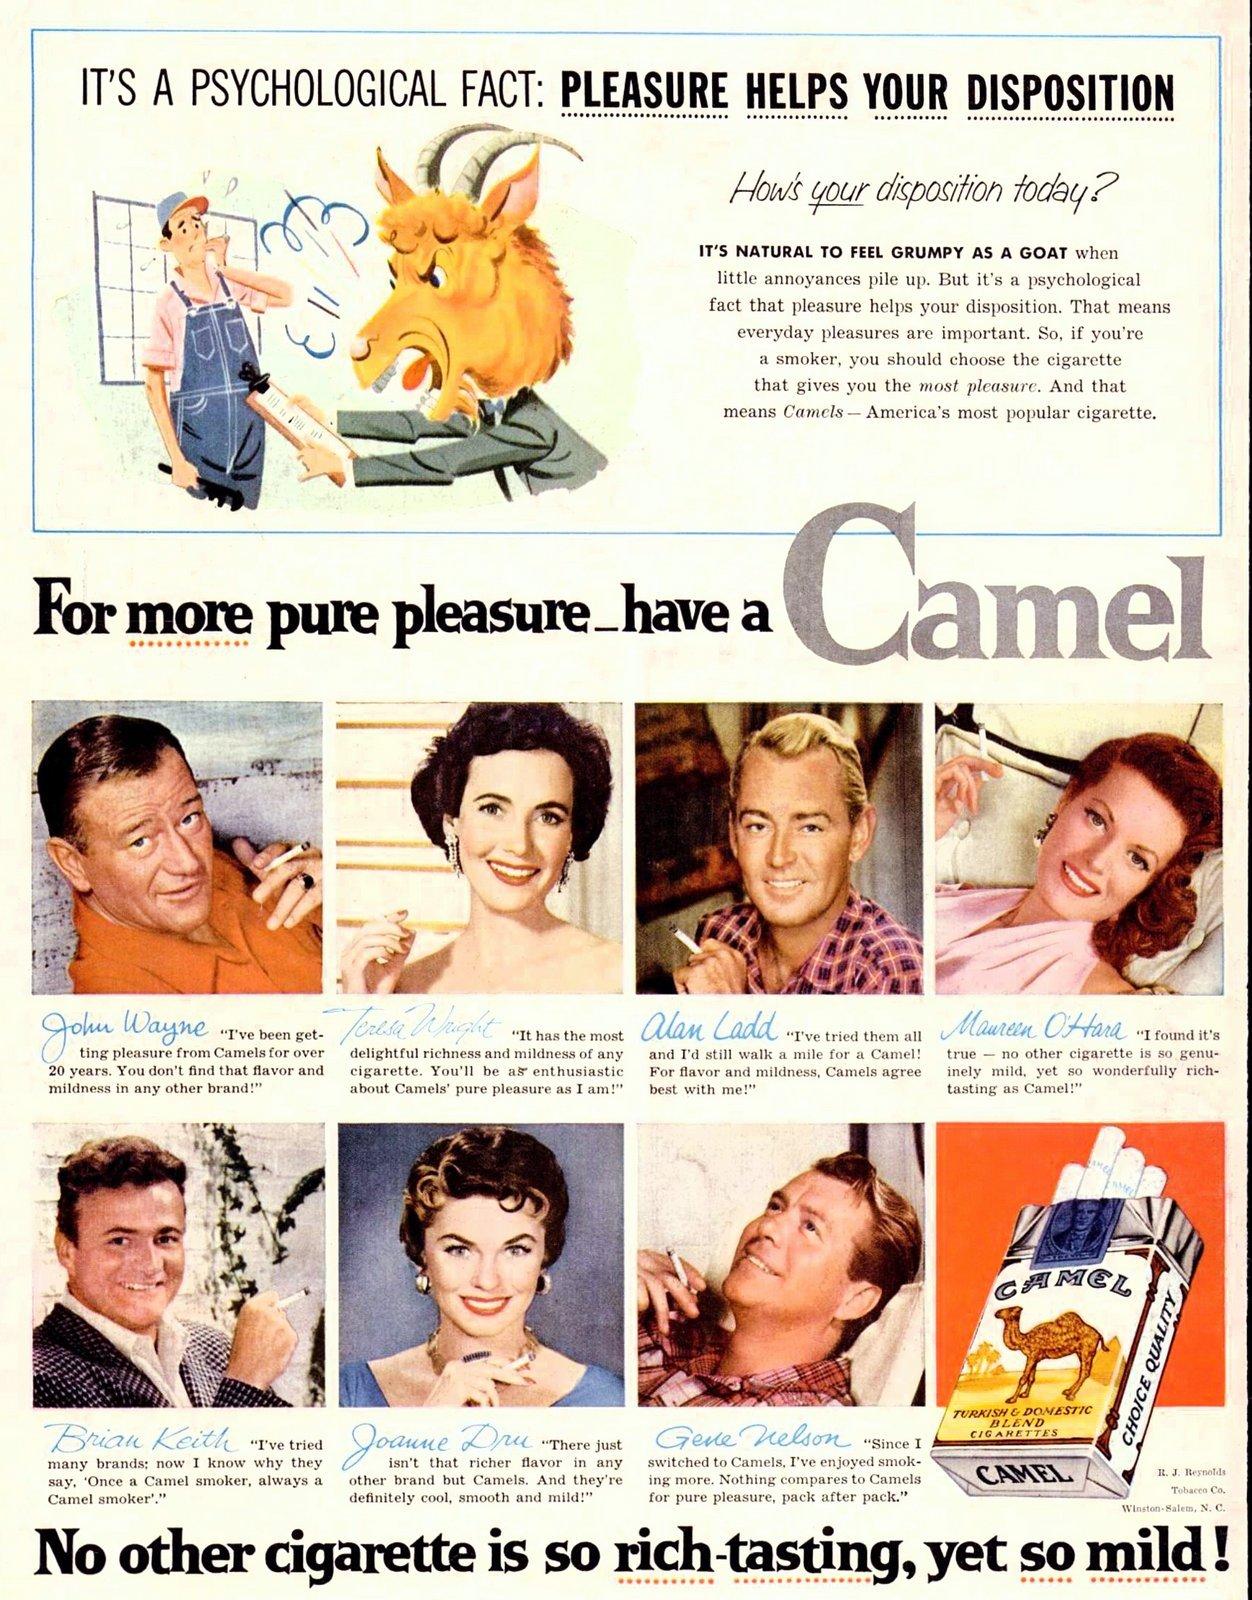 Celebrities pitch Camel cigarettes (1955)